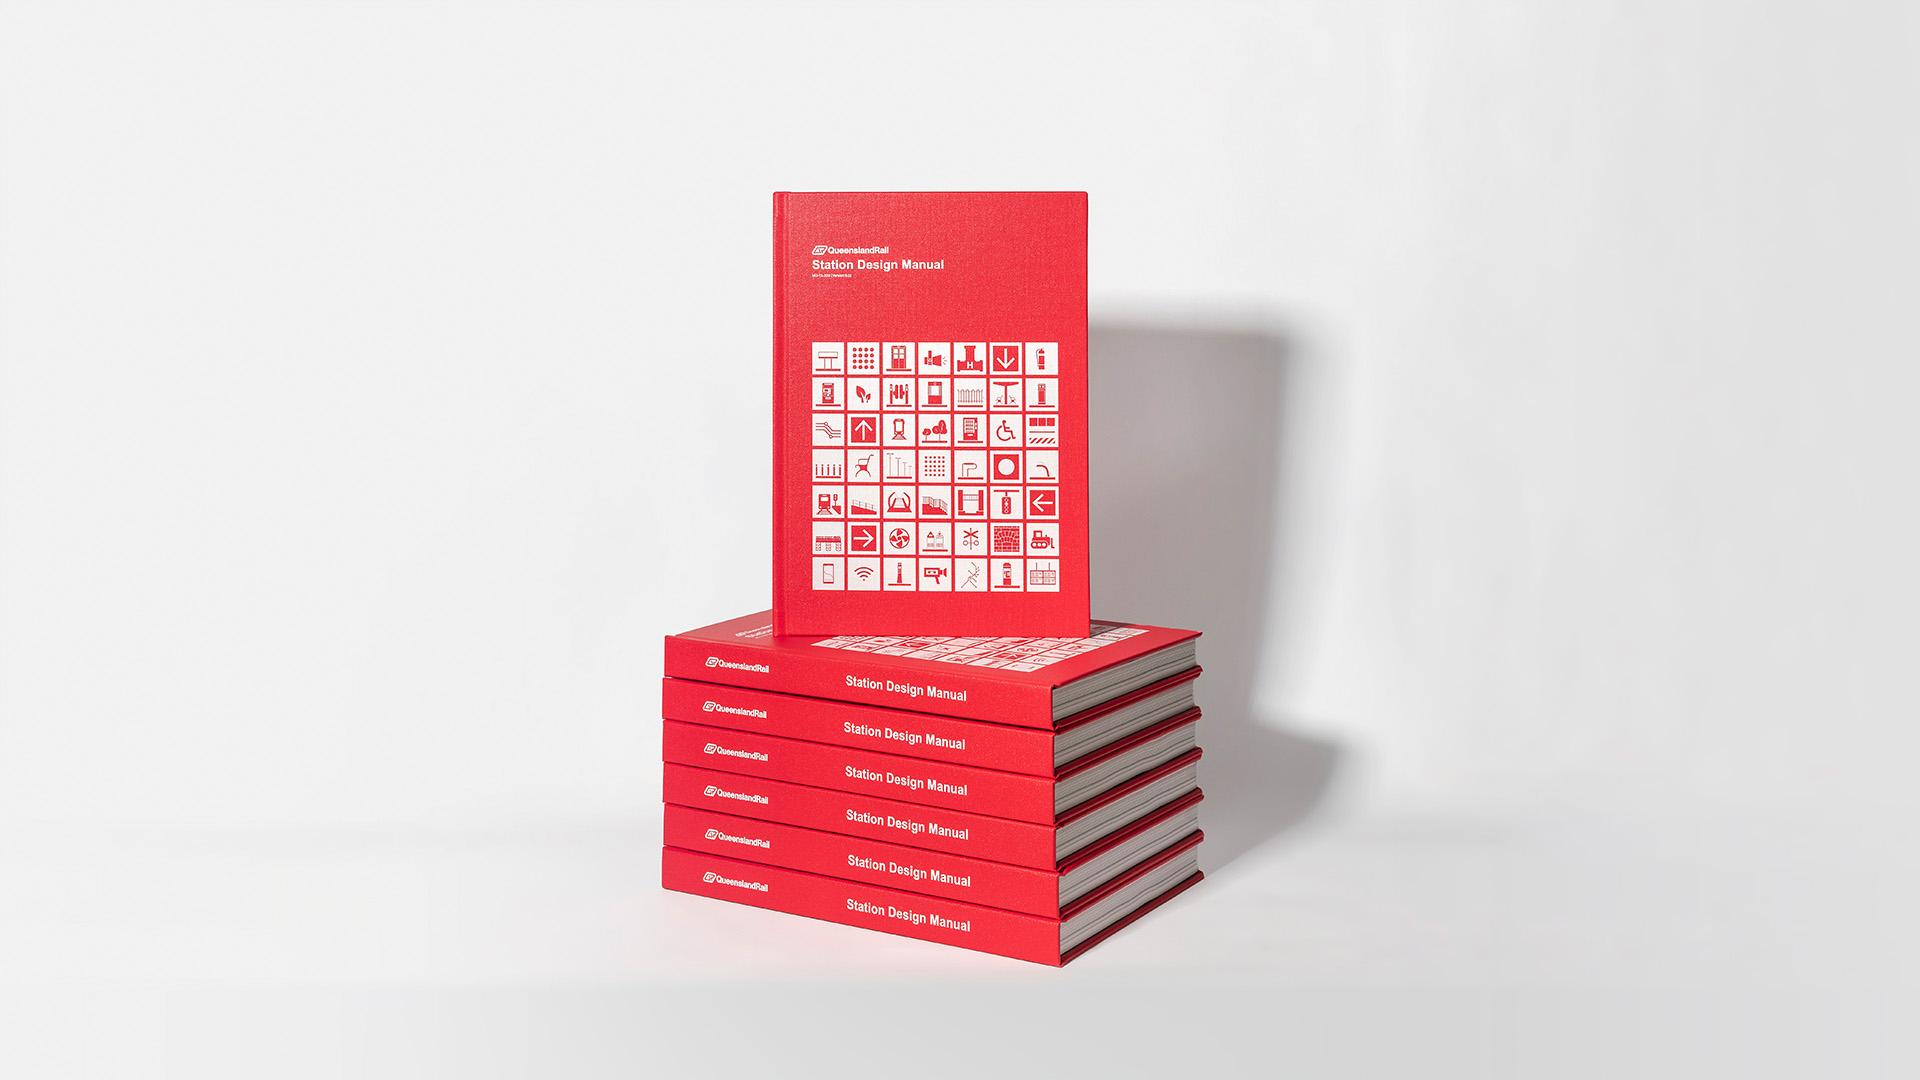 Queensland Rail Station Design Manual printed books